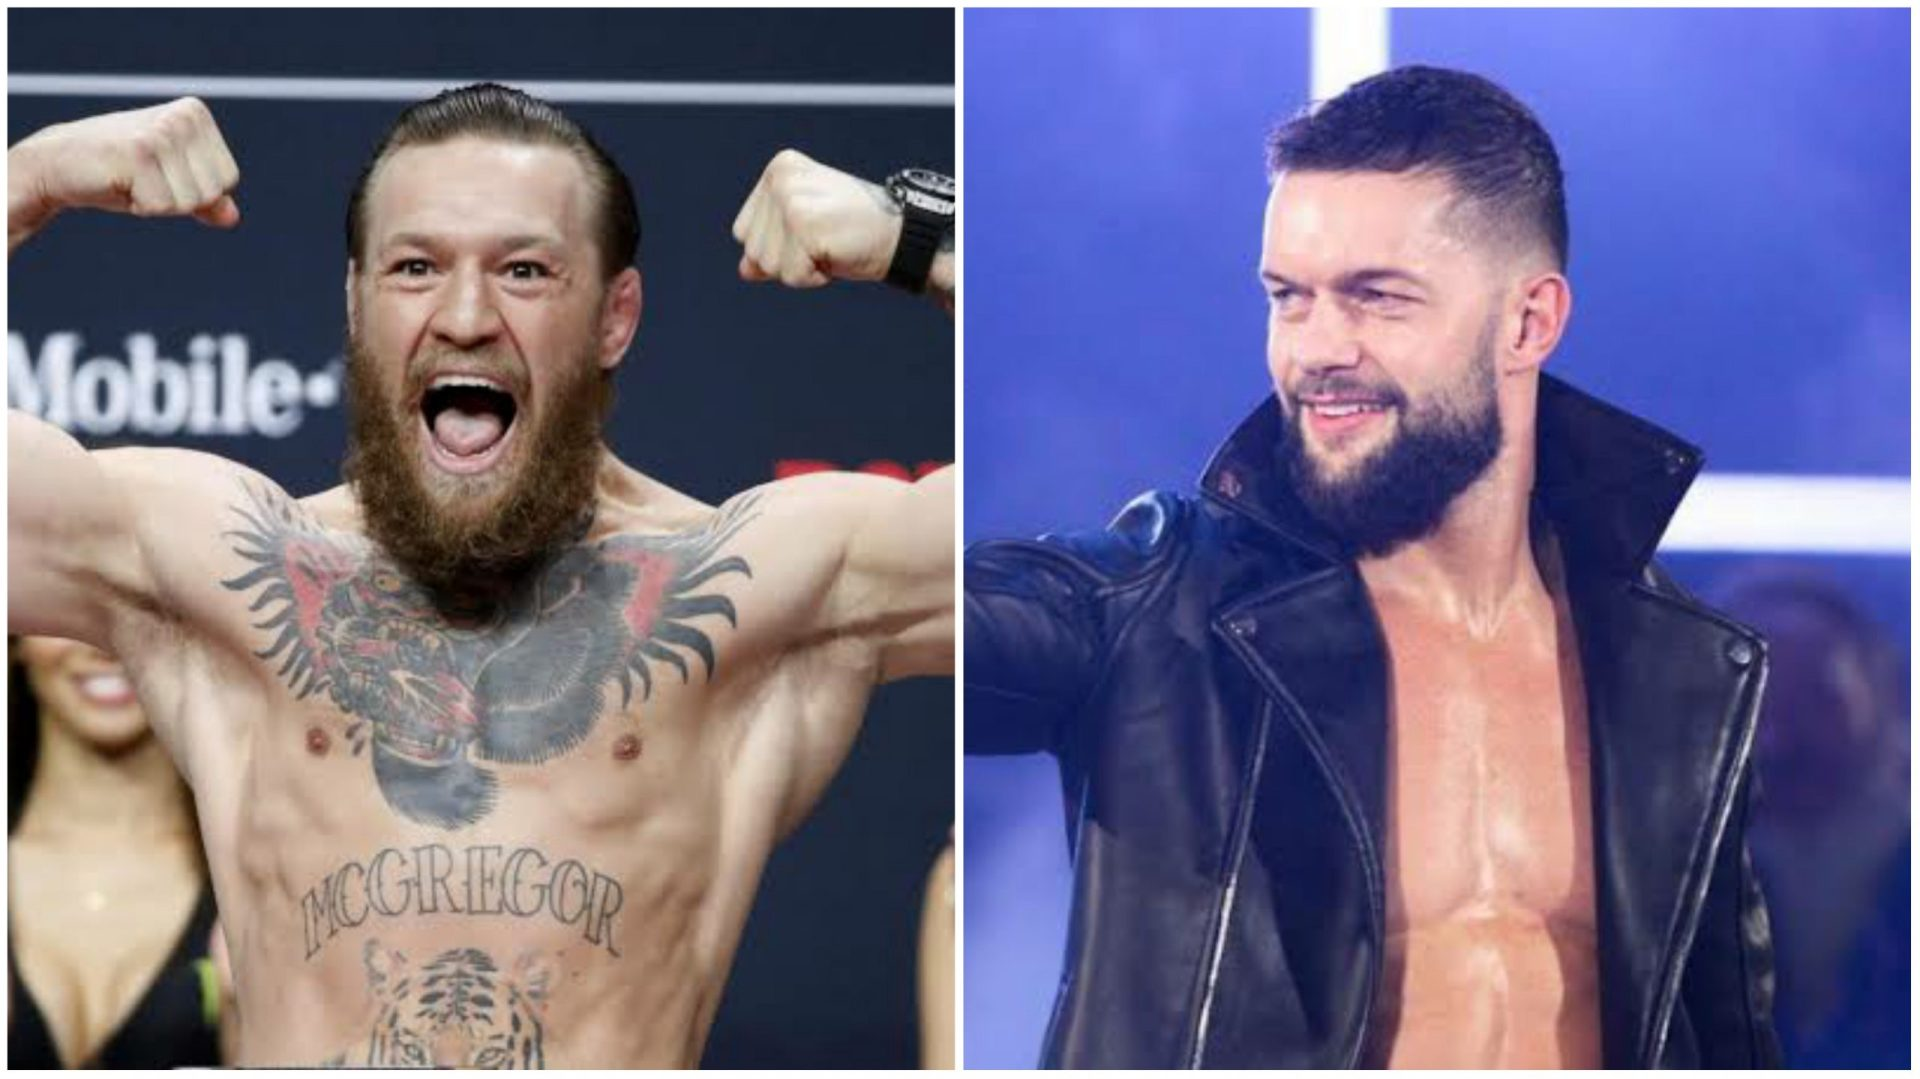 Finn Bálor challenges Conor McGregor on Twitter, McGregor replies - THE SPORTS ROOM